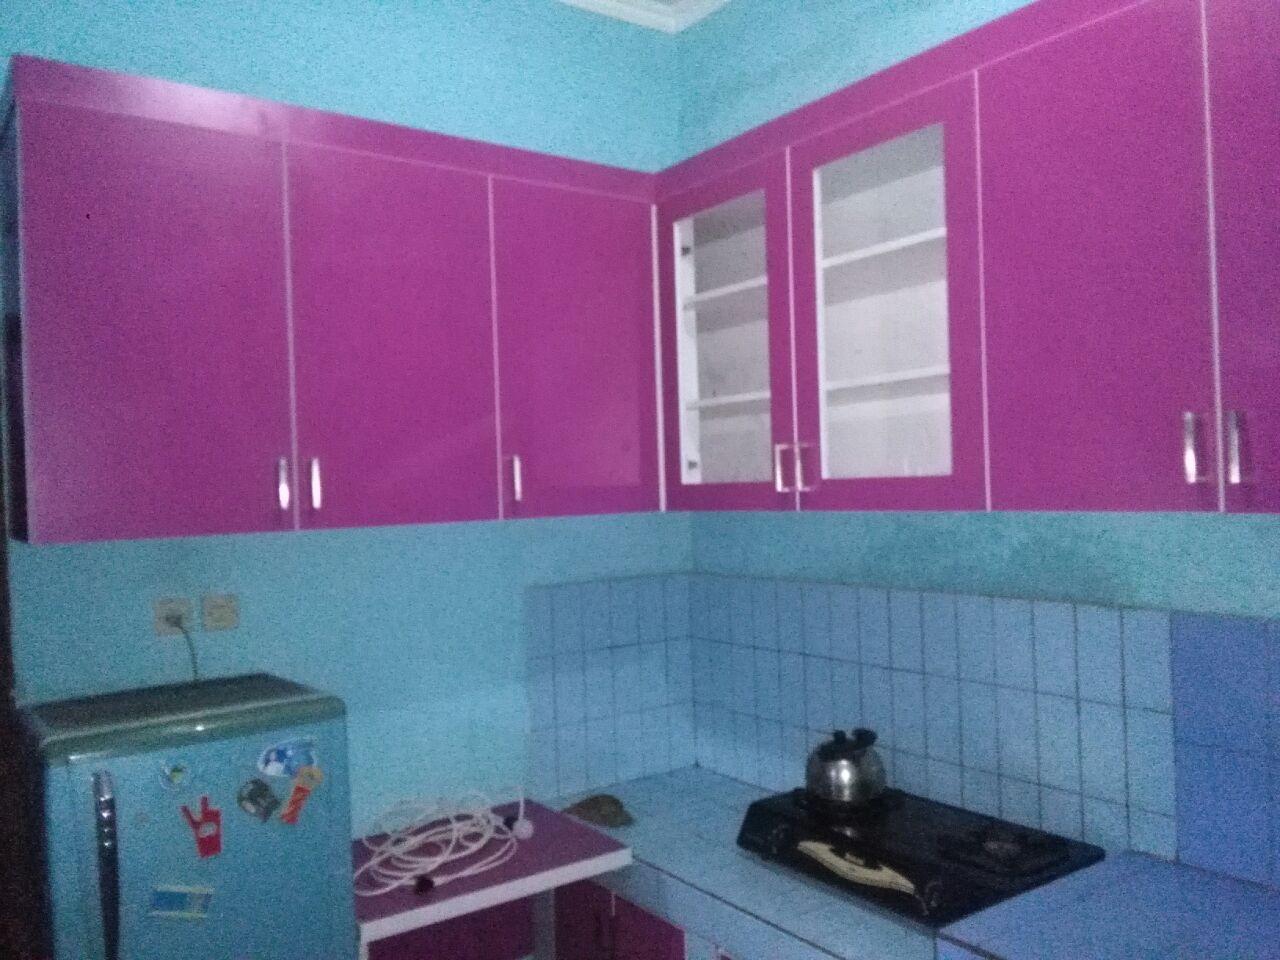 Jasa Kitchen Set Pamulang Murah per meter 1 juta an - Jasa Kitchen ...